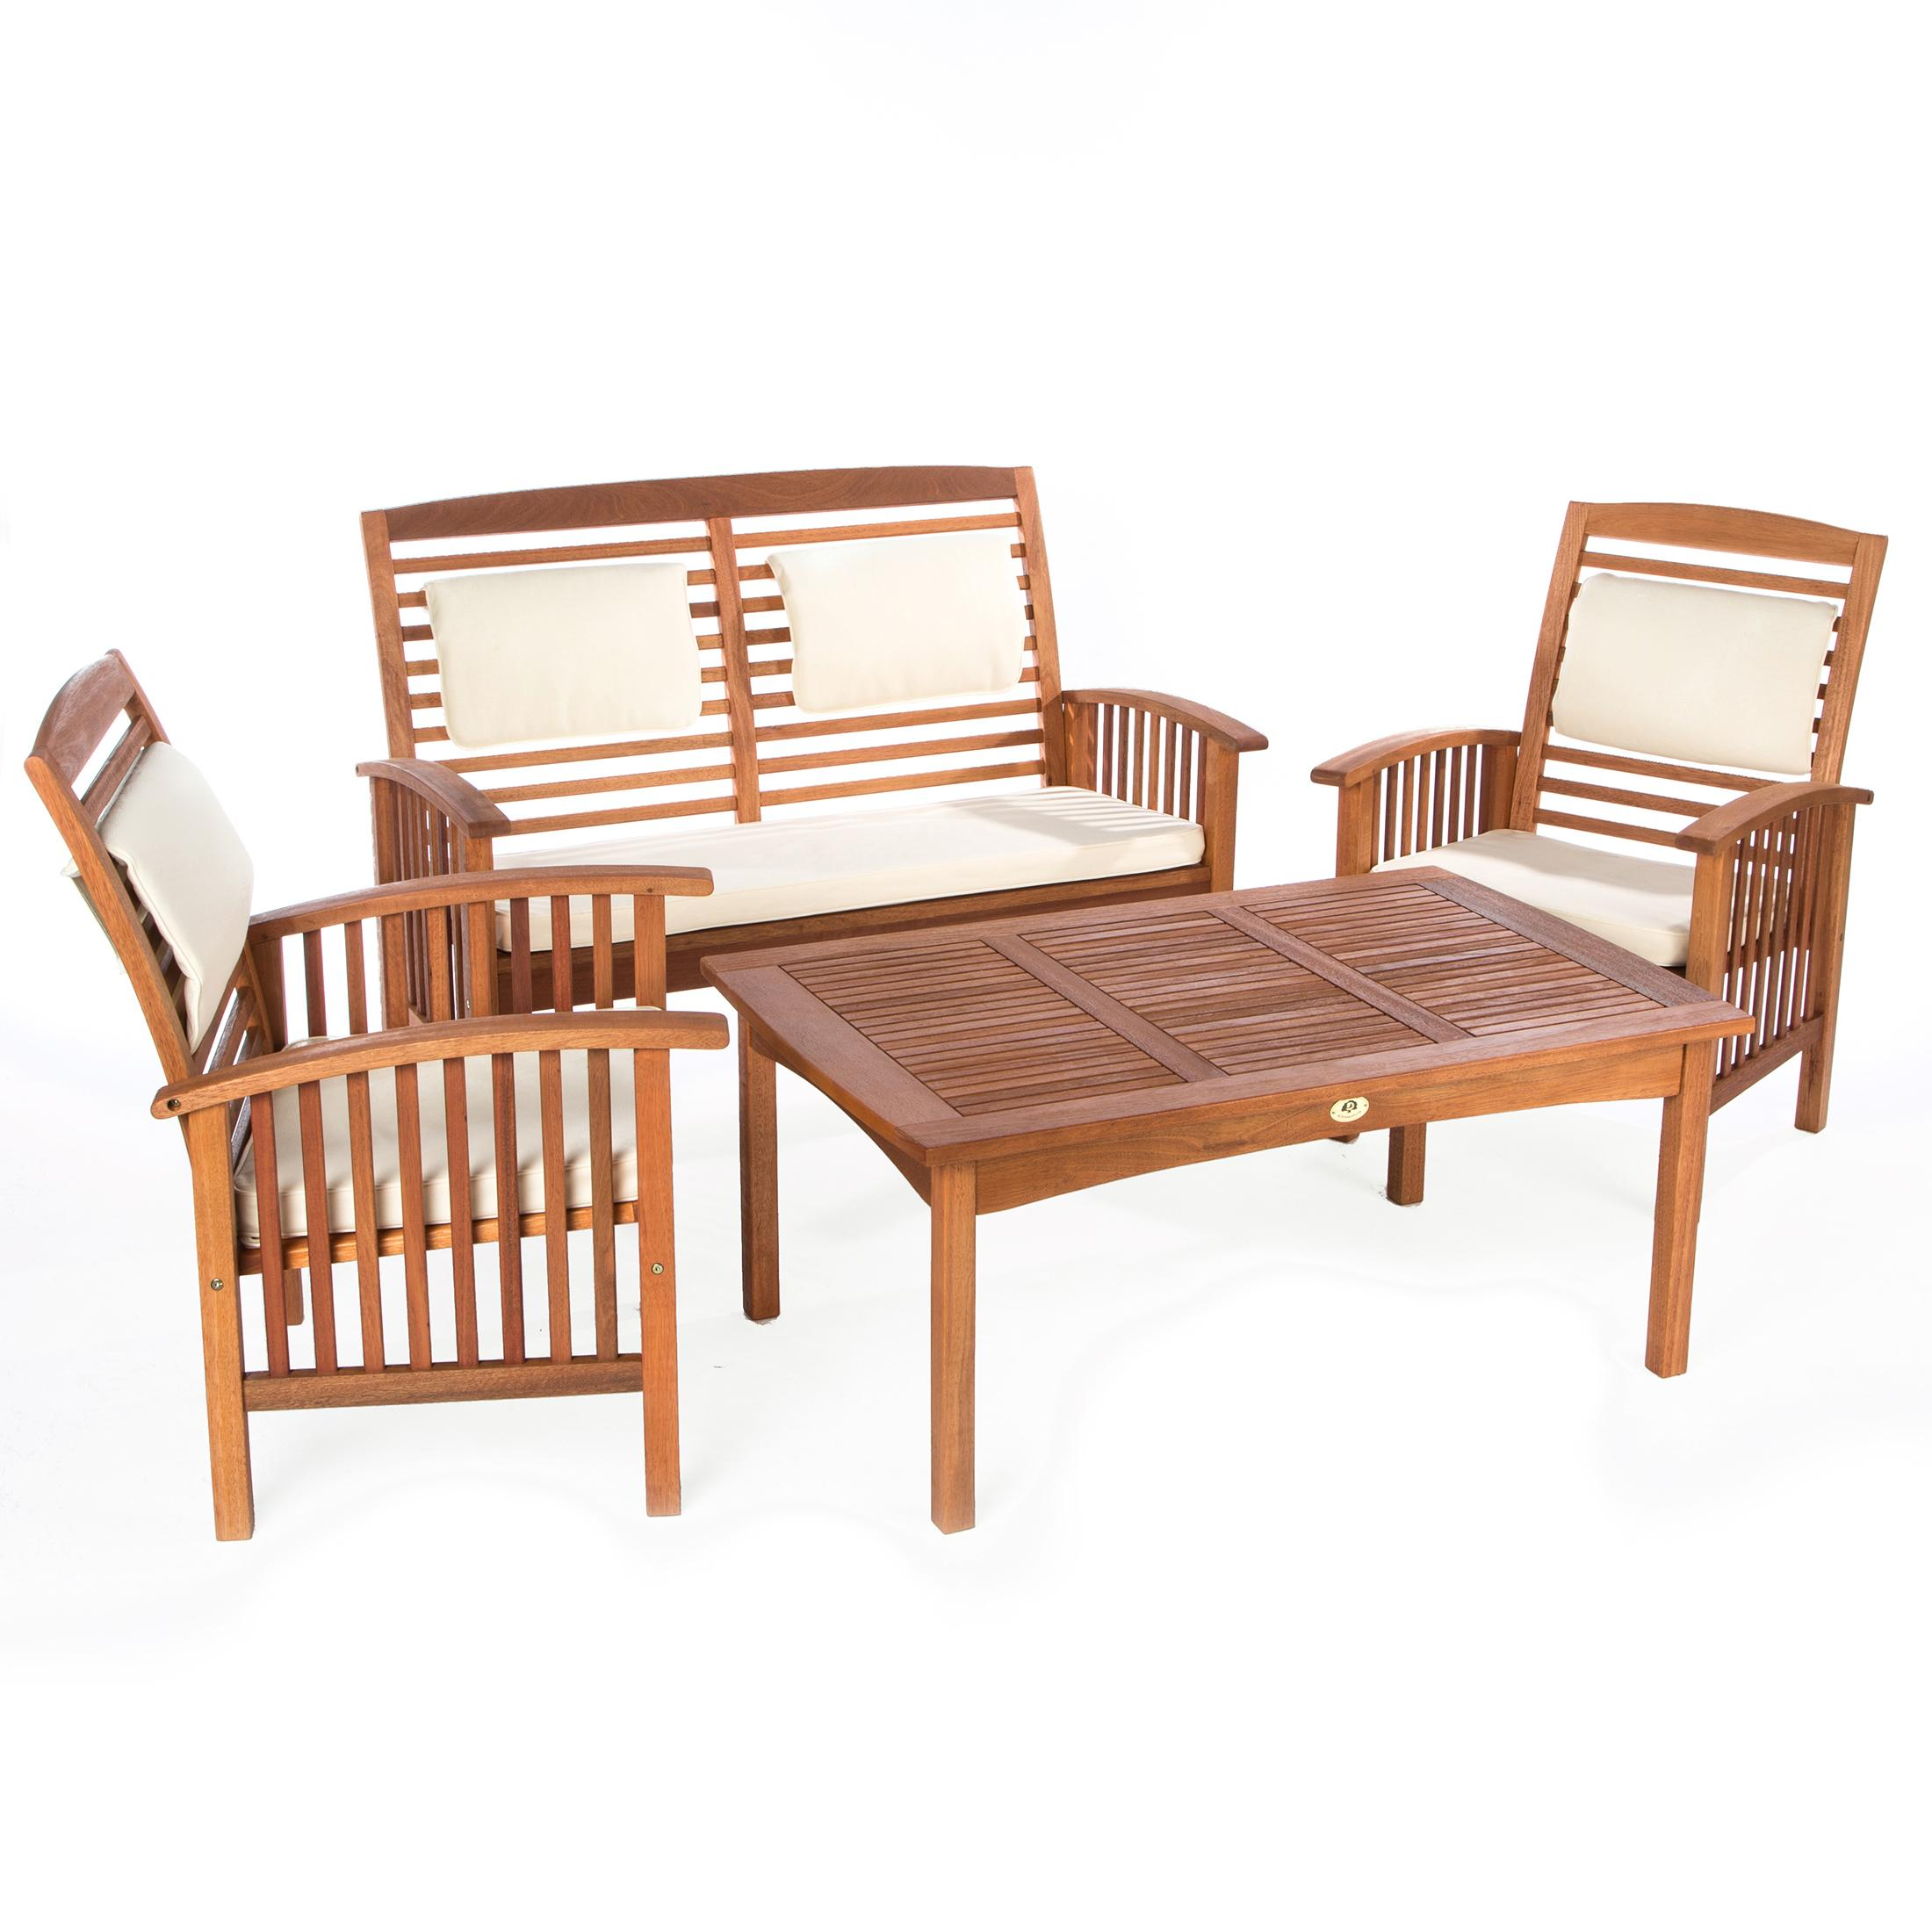 ultranatura table lounge gamme canberra l gant bois d. Black Bedroom Furniture Sets. Home Design Ideas